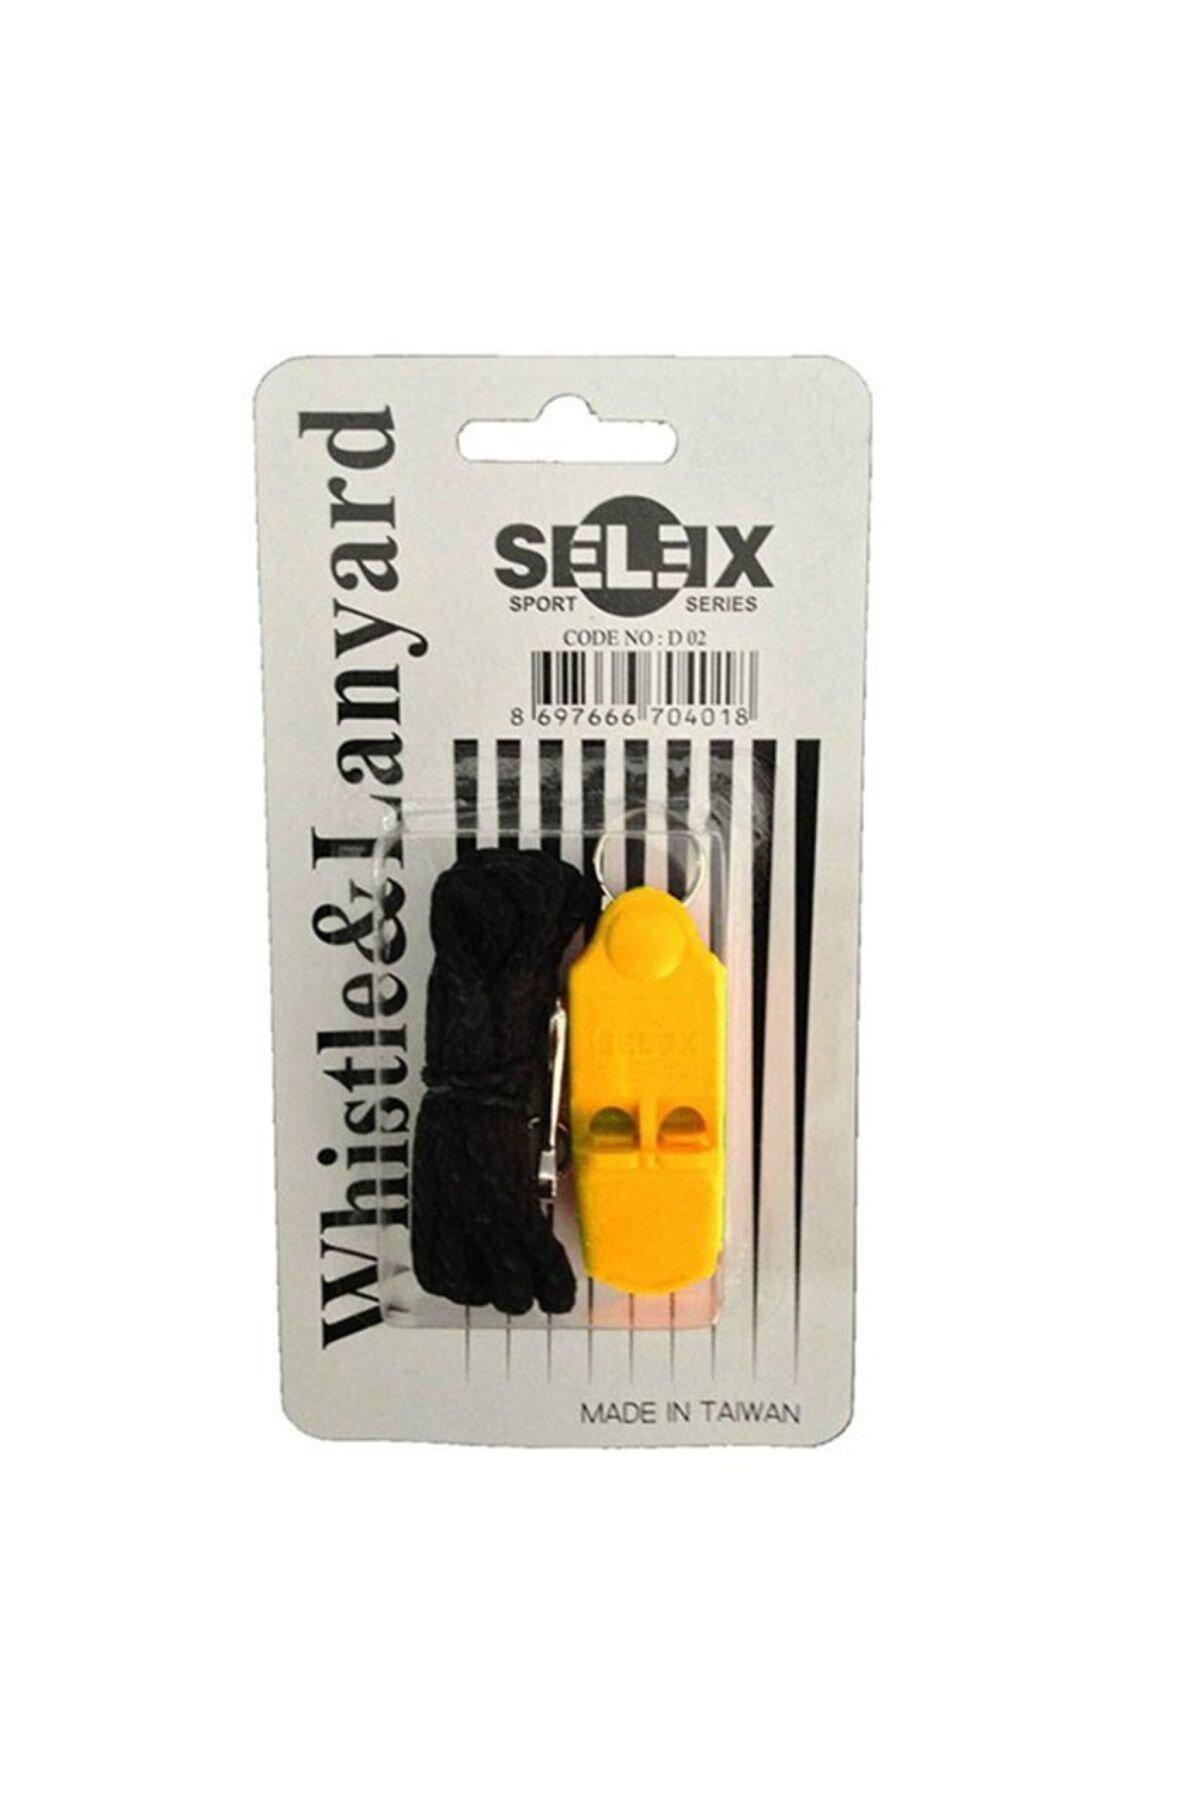 SELEX Siyah Ipli Düdük  D 02 1